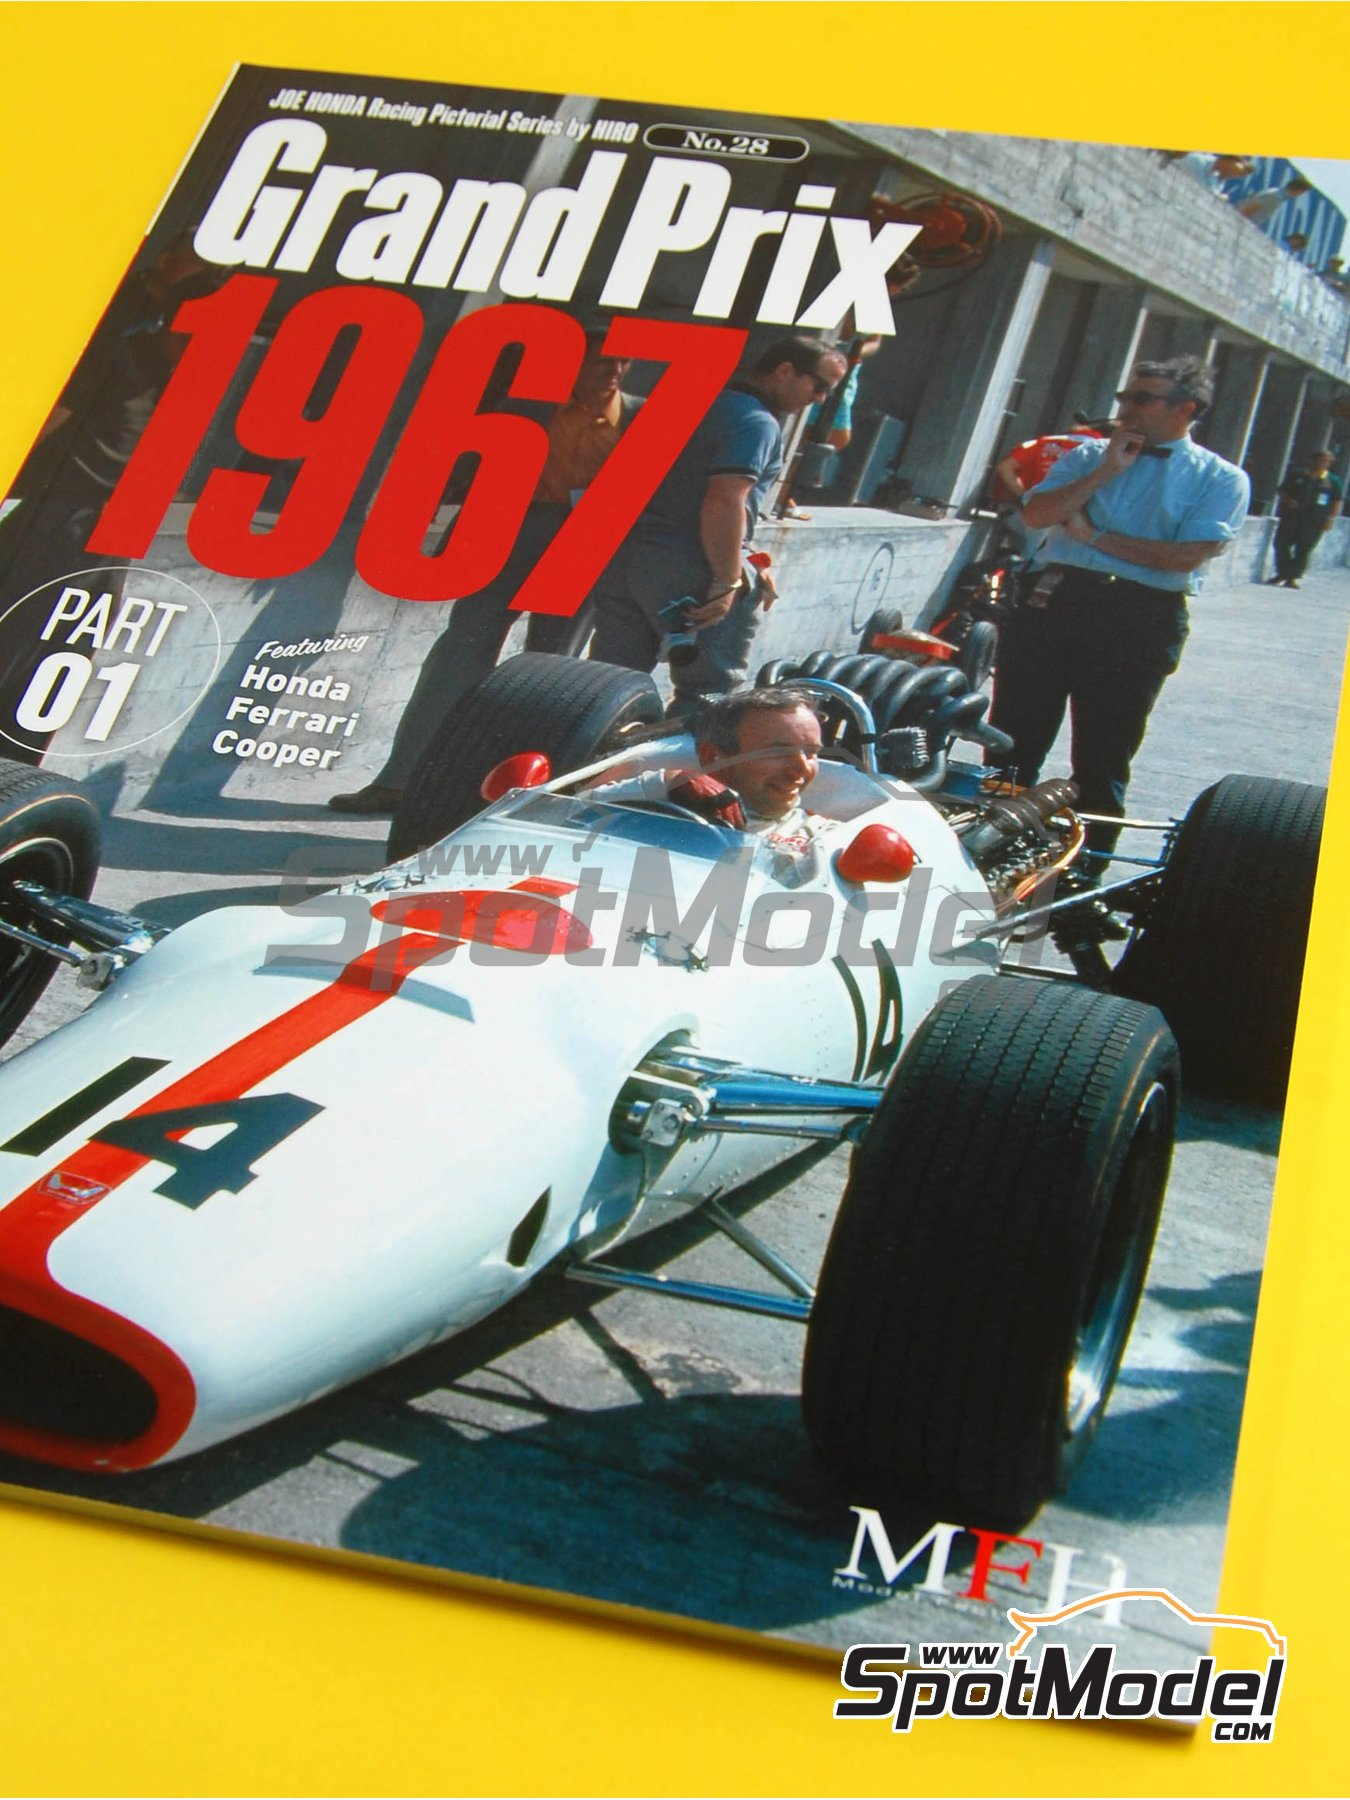 JOE HONDA Racing Pictorial Series - Grand Prix Cars - Primer volumen -  1967   Libro de referencia fabricado por Model Factory Hiro (ref.MFH-JH28) image